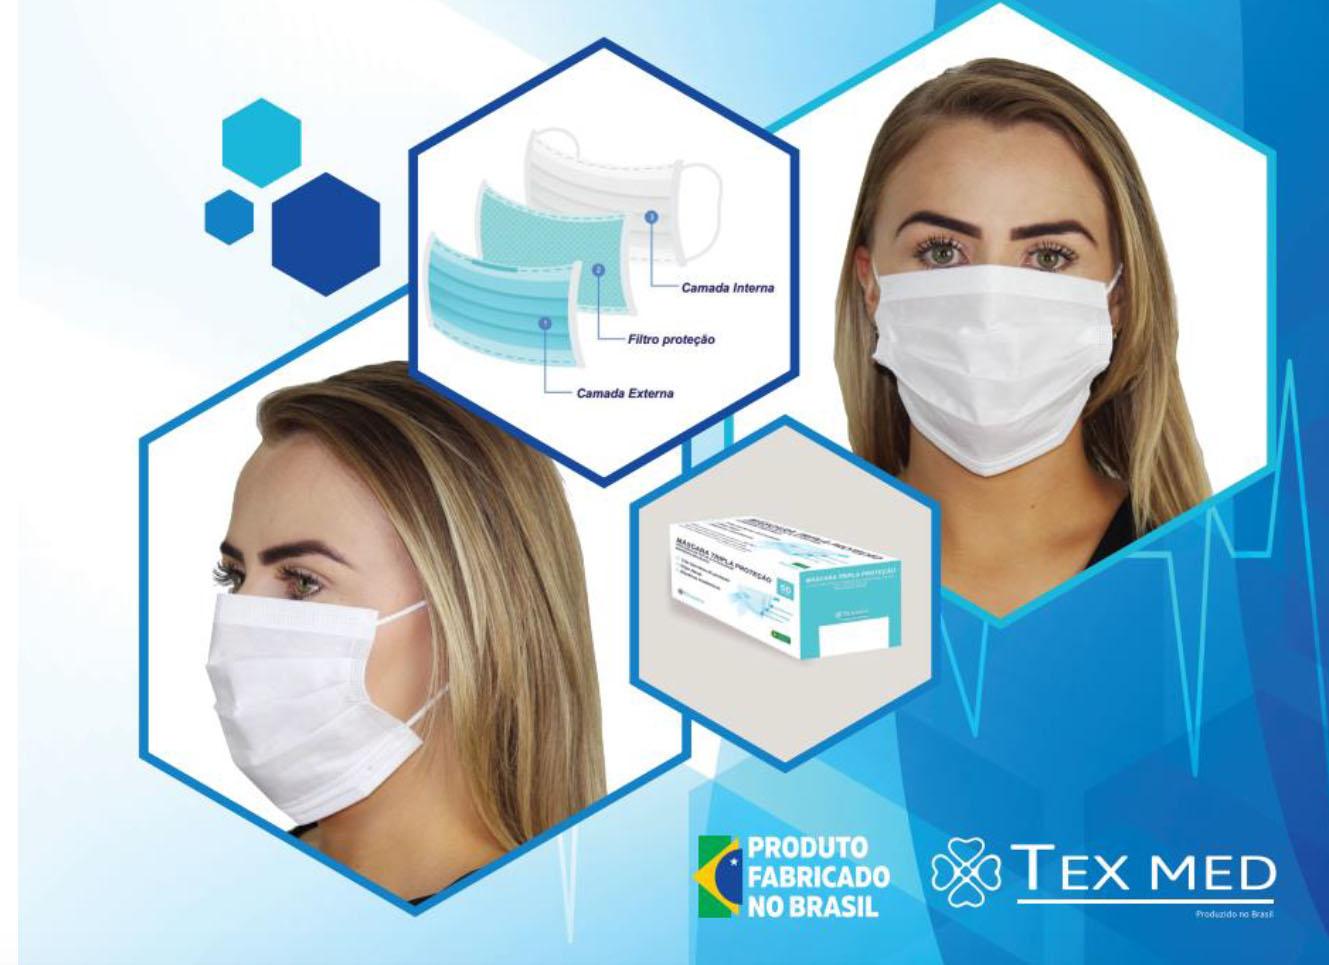 Máscara Tripla Cirúrgica TEXMED c/ filtro bateriológico BFE - caixa com 50 unidades